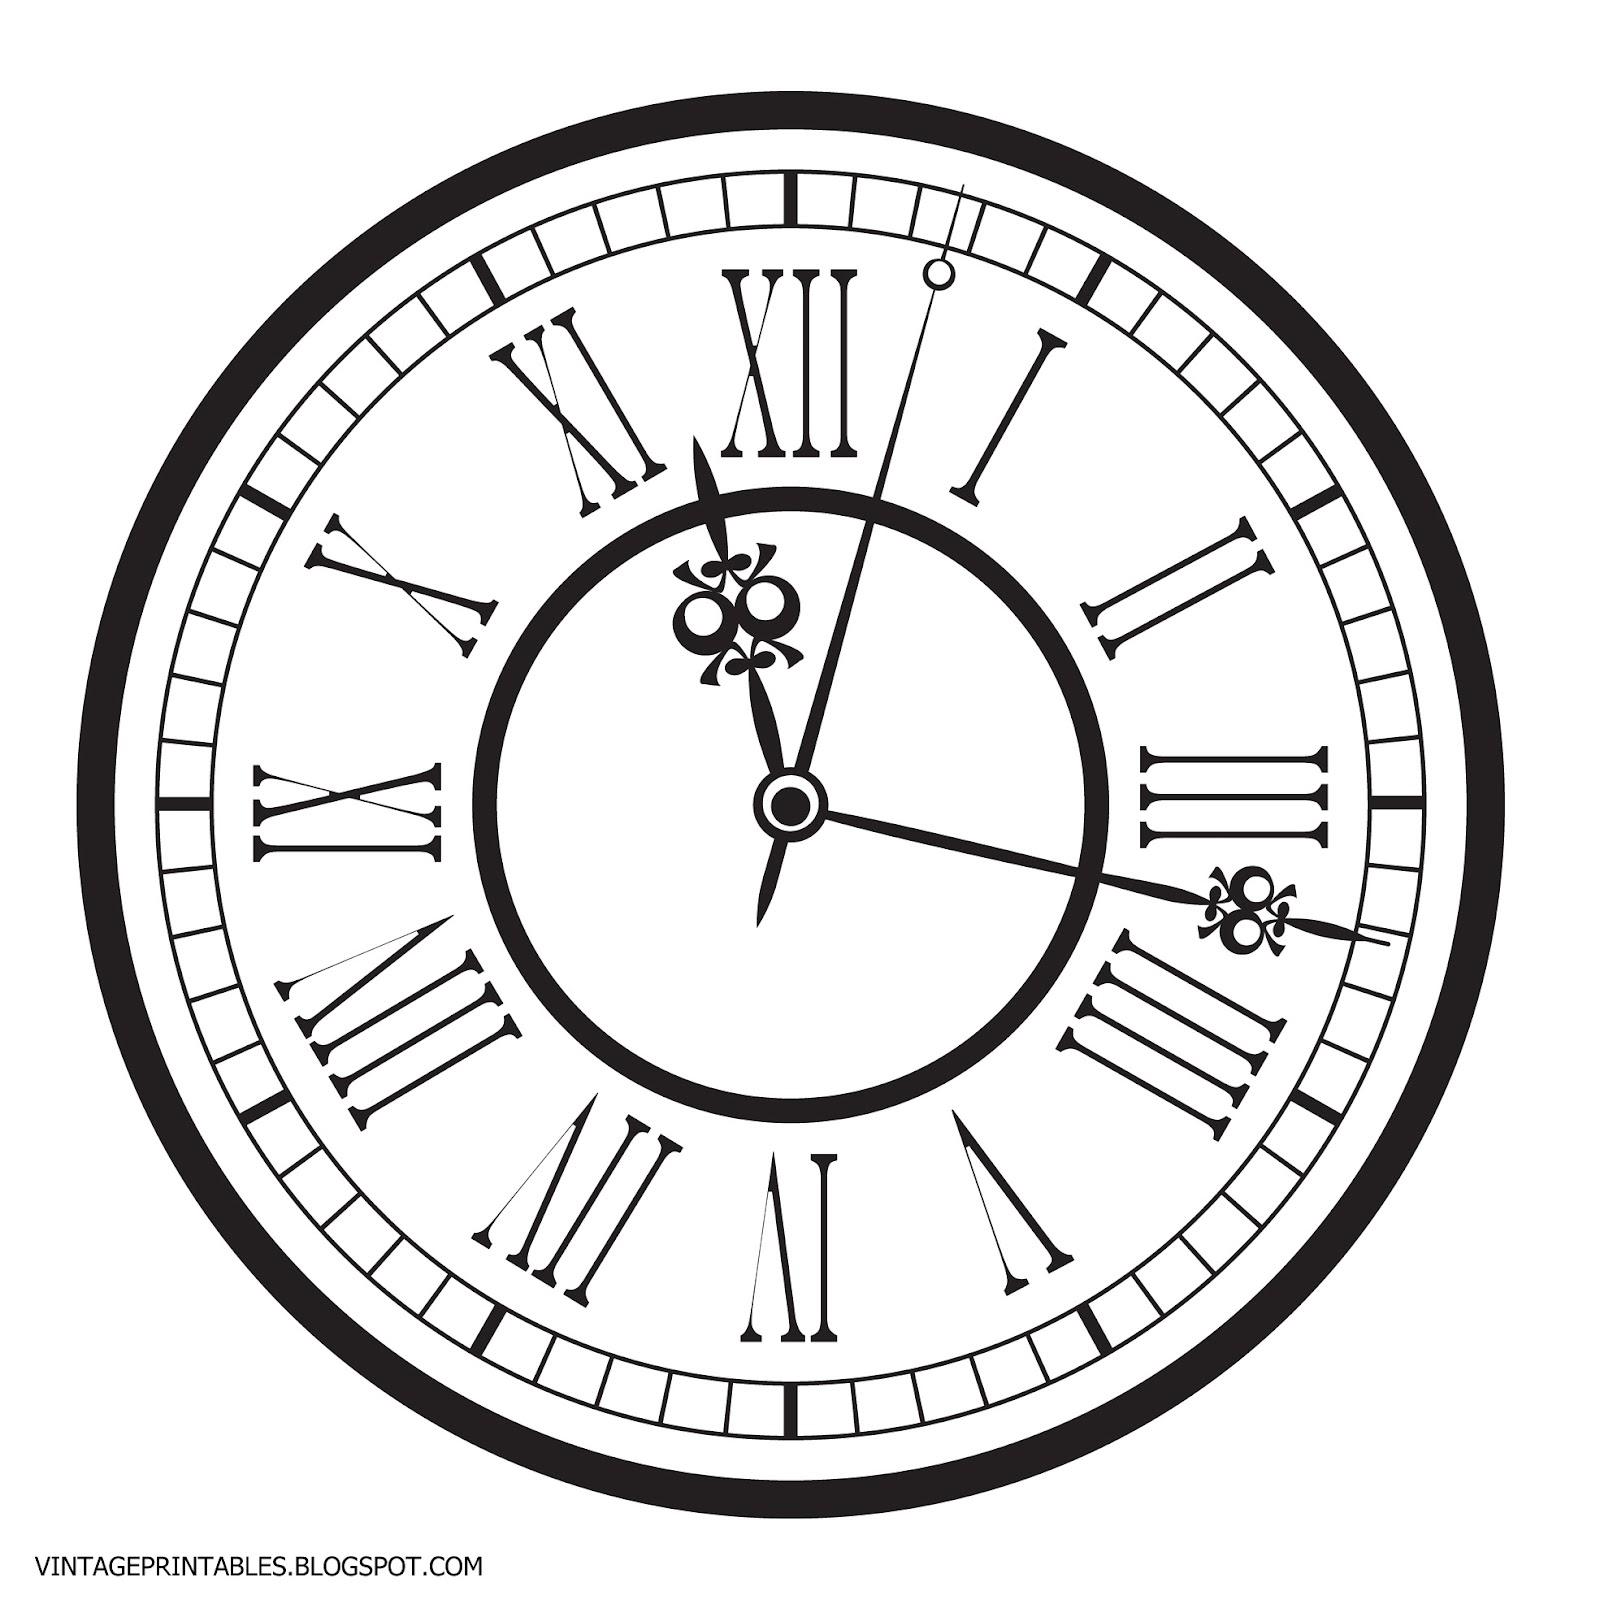 Free vintage clip art images: Old antique clock free clip art.